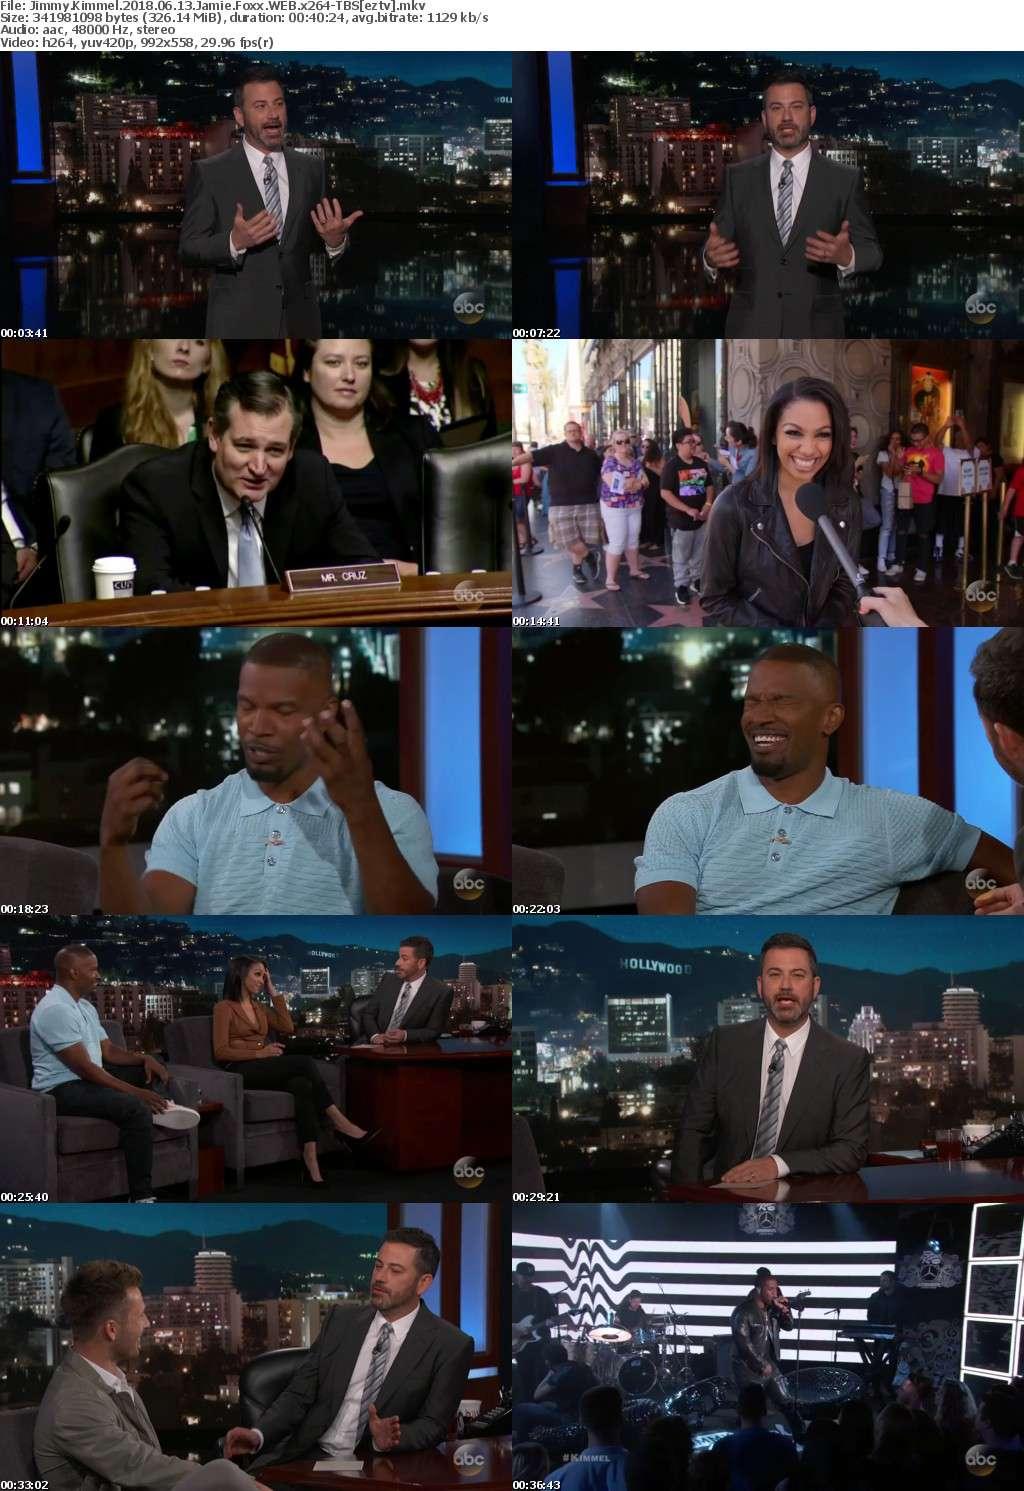 Jimmy Kimmel 2018 06 13 Jamie Foxx WEB x264-TBS